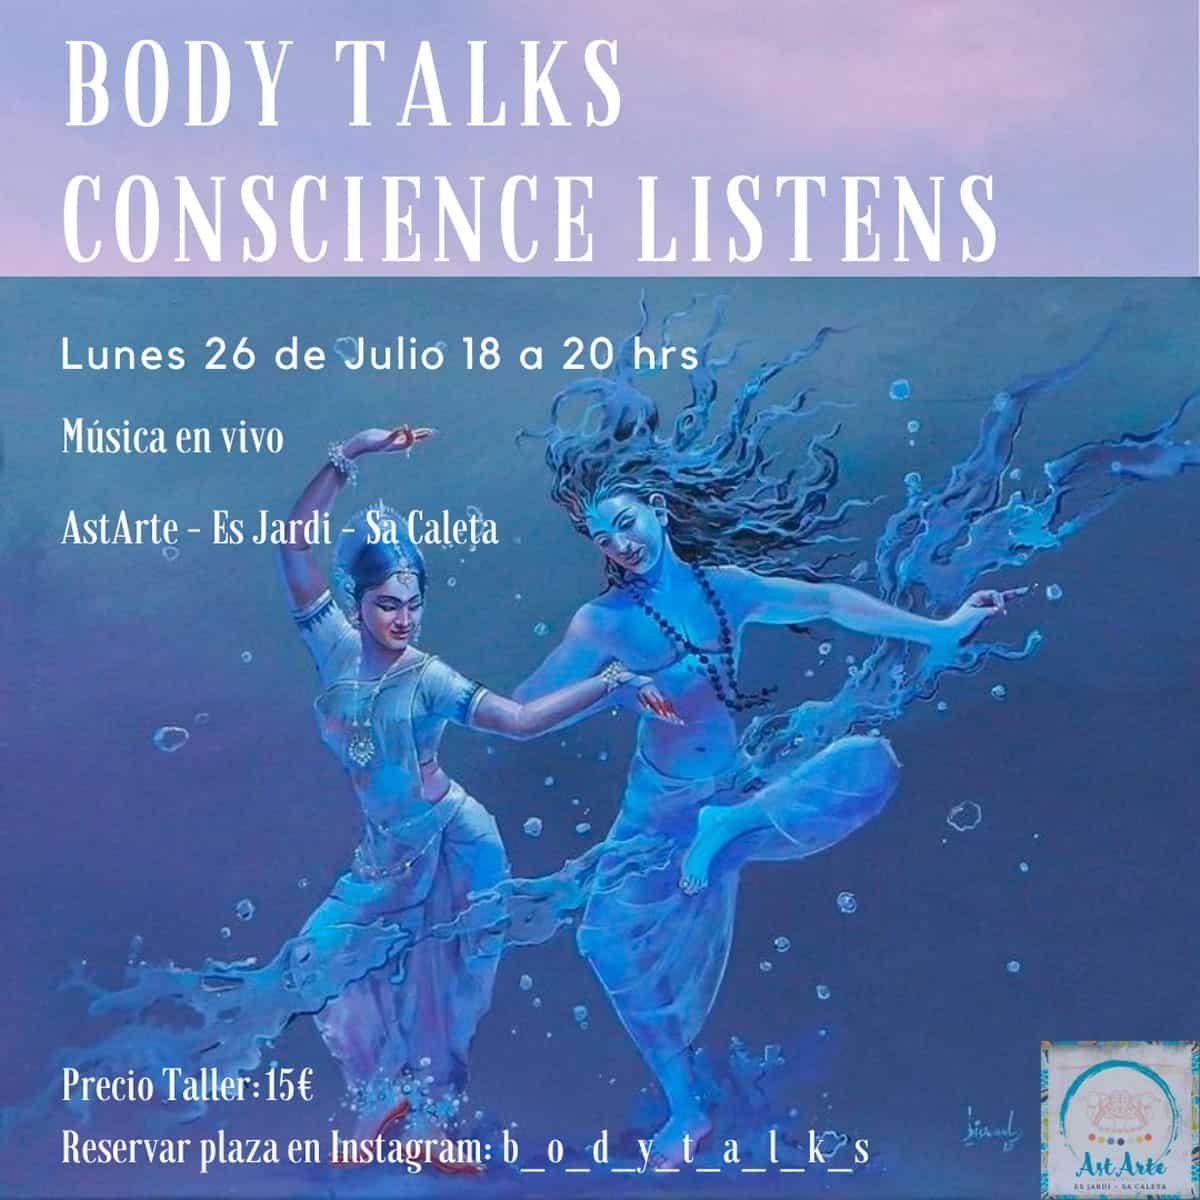 body-talks-conscience-listens-astarte-el-jardin-sa-caleta-ibiza-2021-welcometoibiza